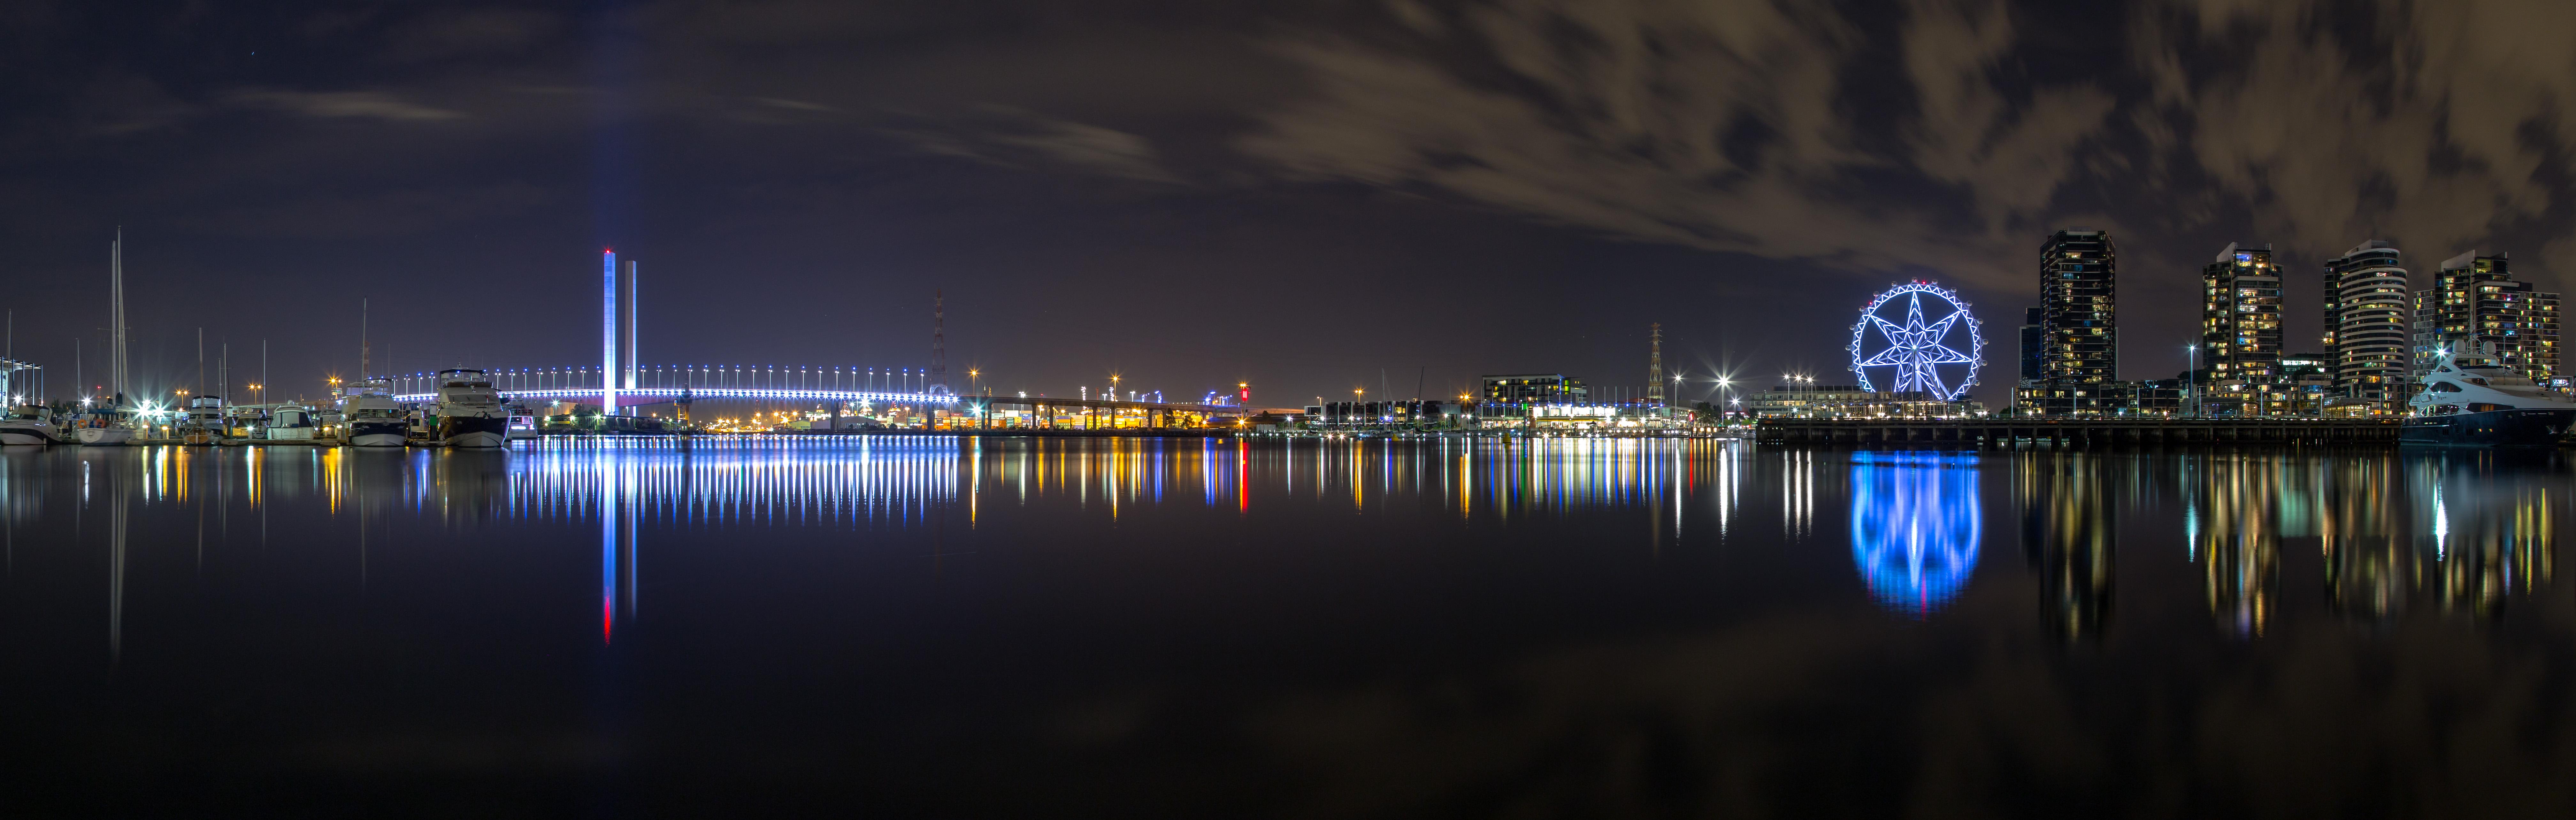 Victoria Harbour, Bolte Bridge and The Melbourne Star